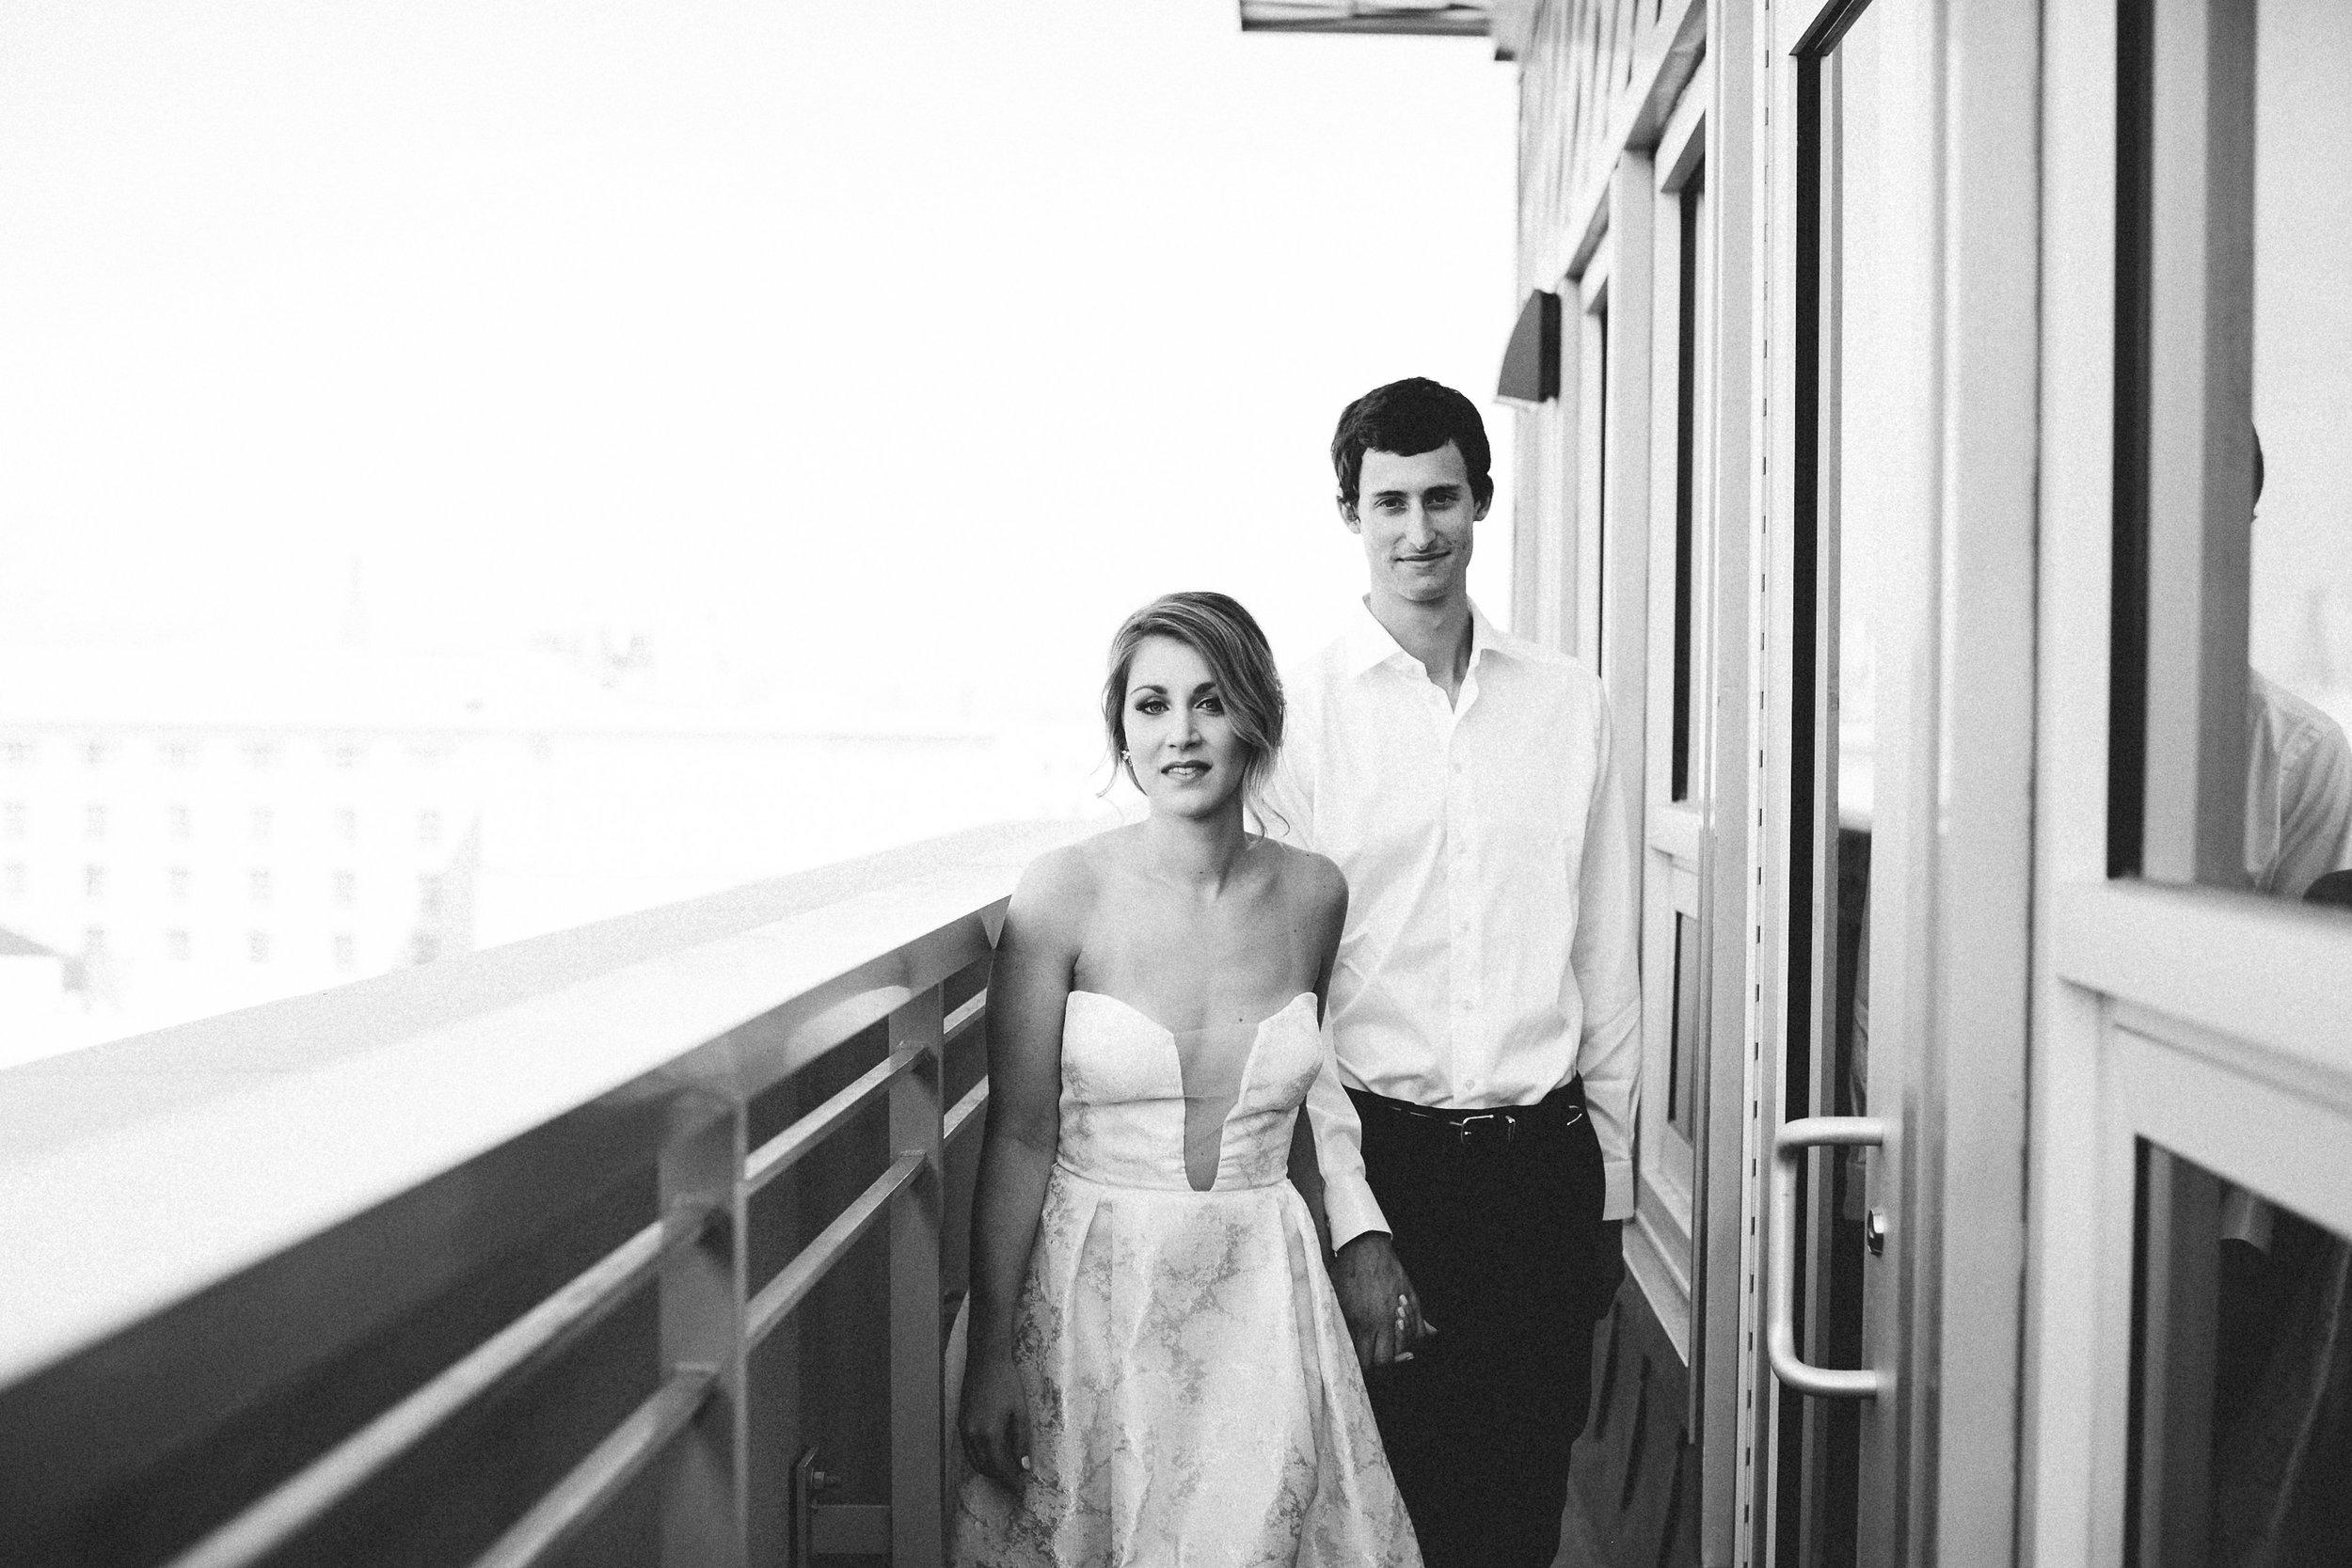 charleston-wedding-elopement-13.jpg